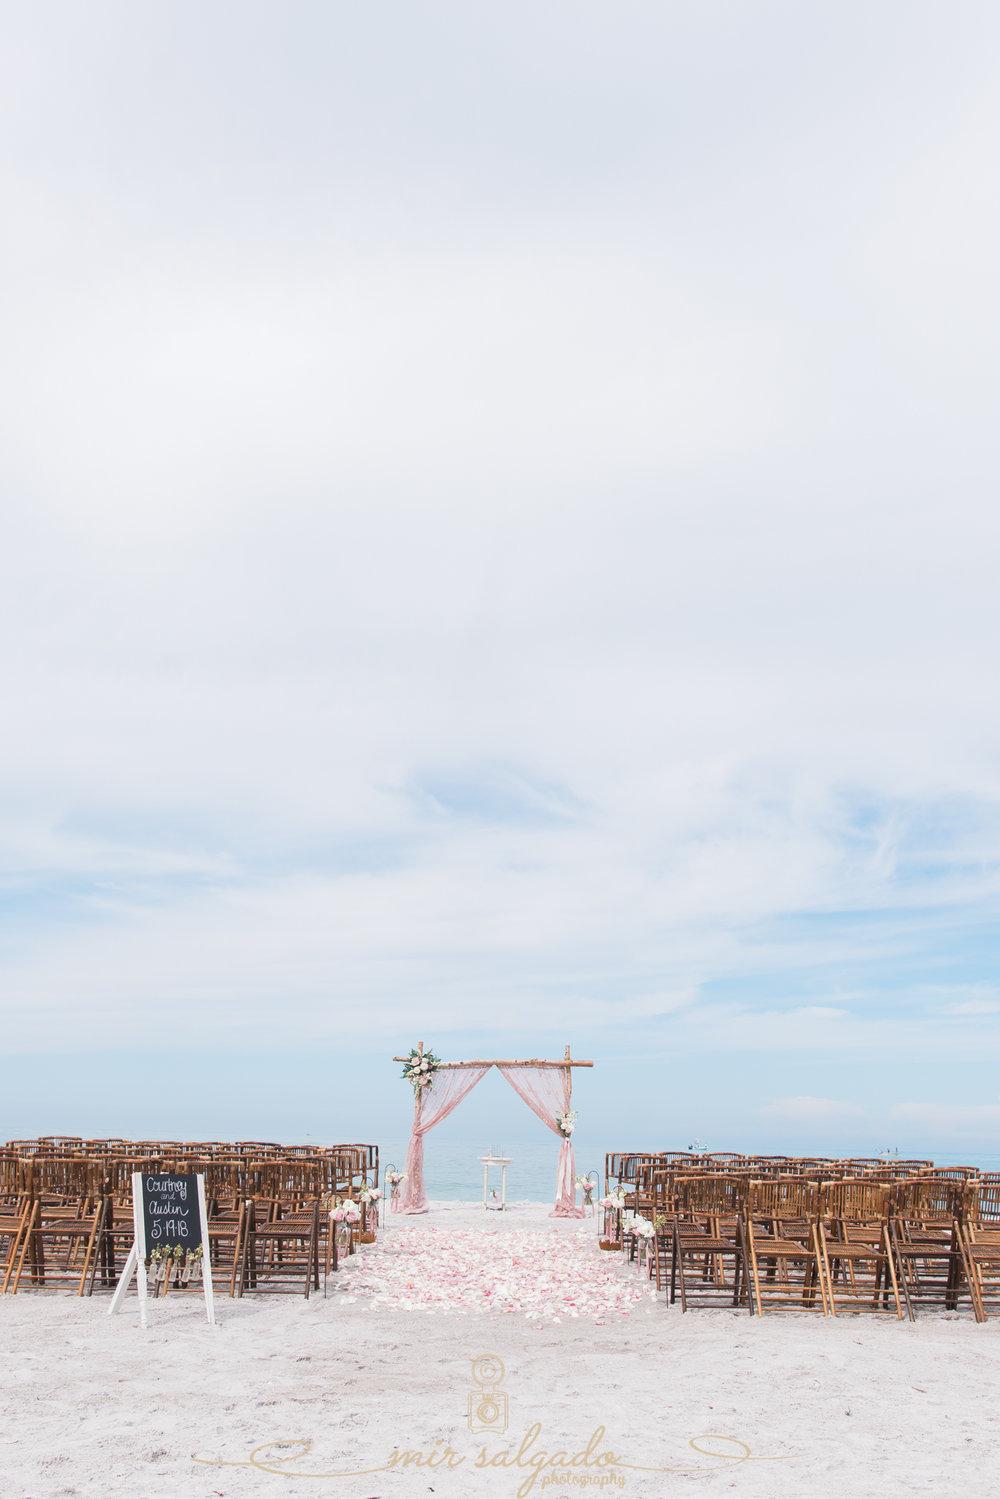 Ted-Sperling-par, Sarasota-beach-wedding, Sarasota-beach-wedding-photo-decoration